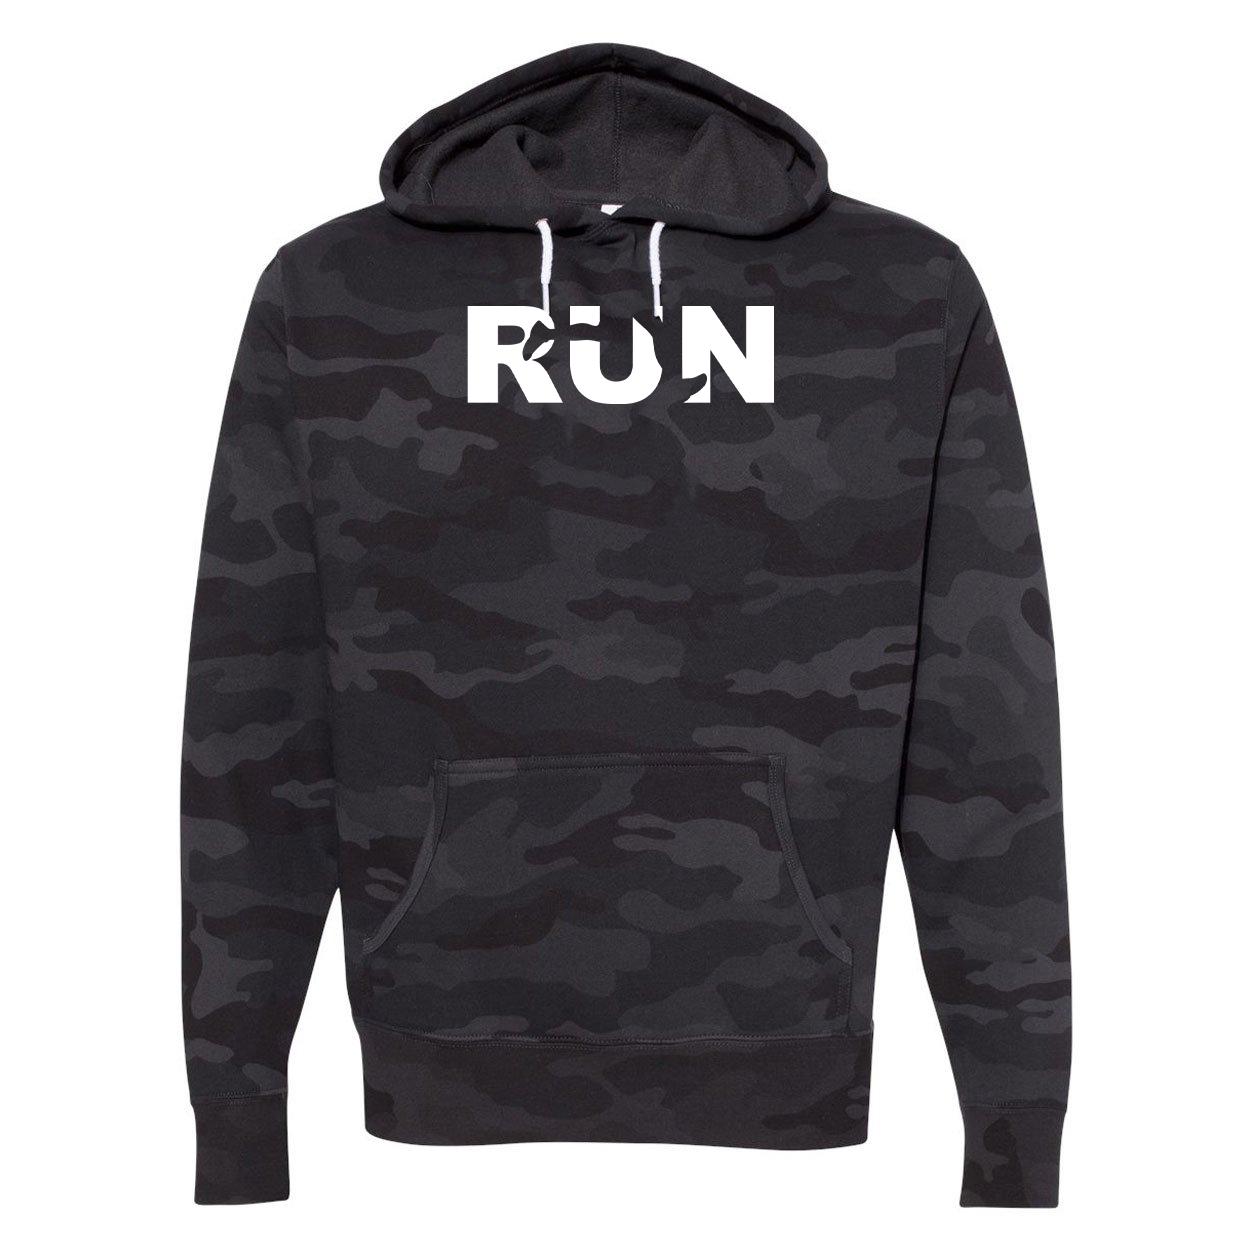 Run Jog Logo Classic Unisex Hooded Sweatshirt Black Camo (White Logo)